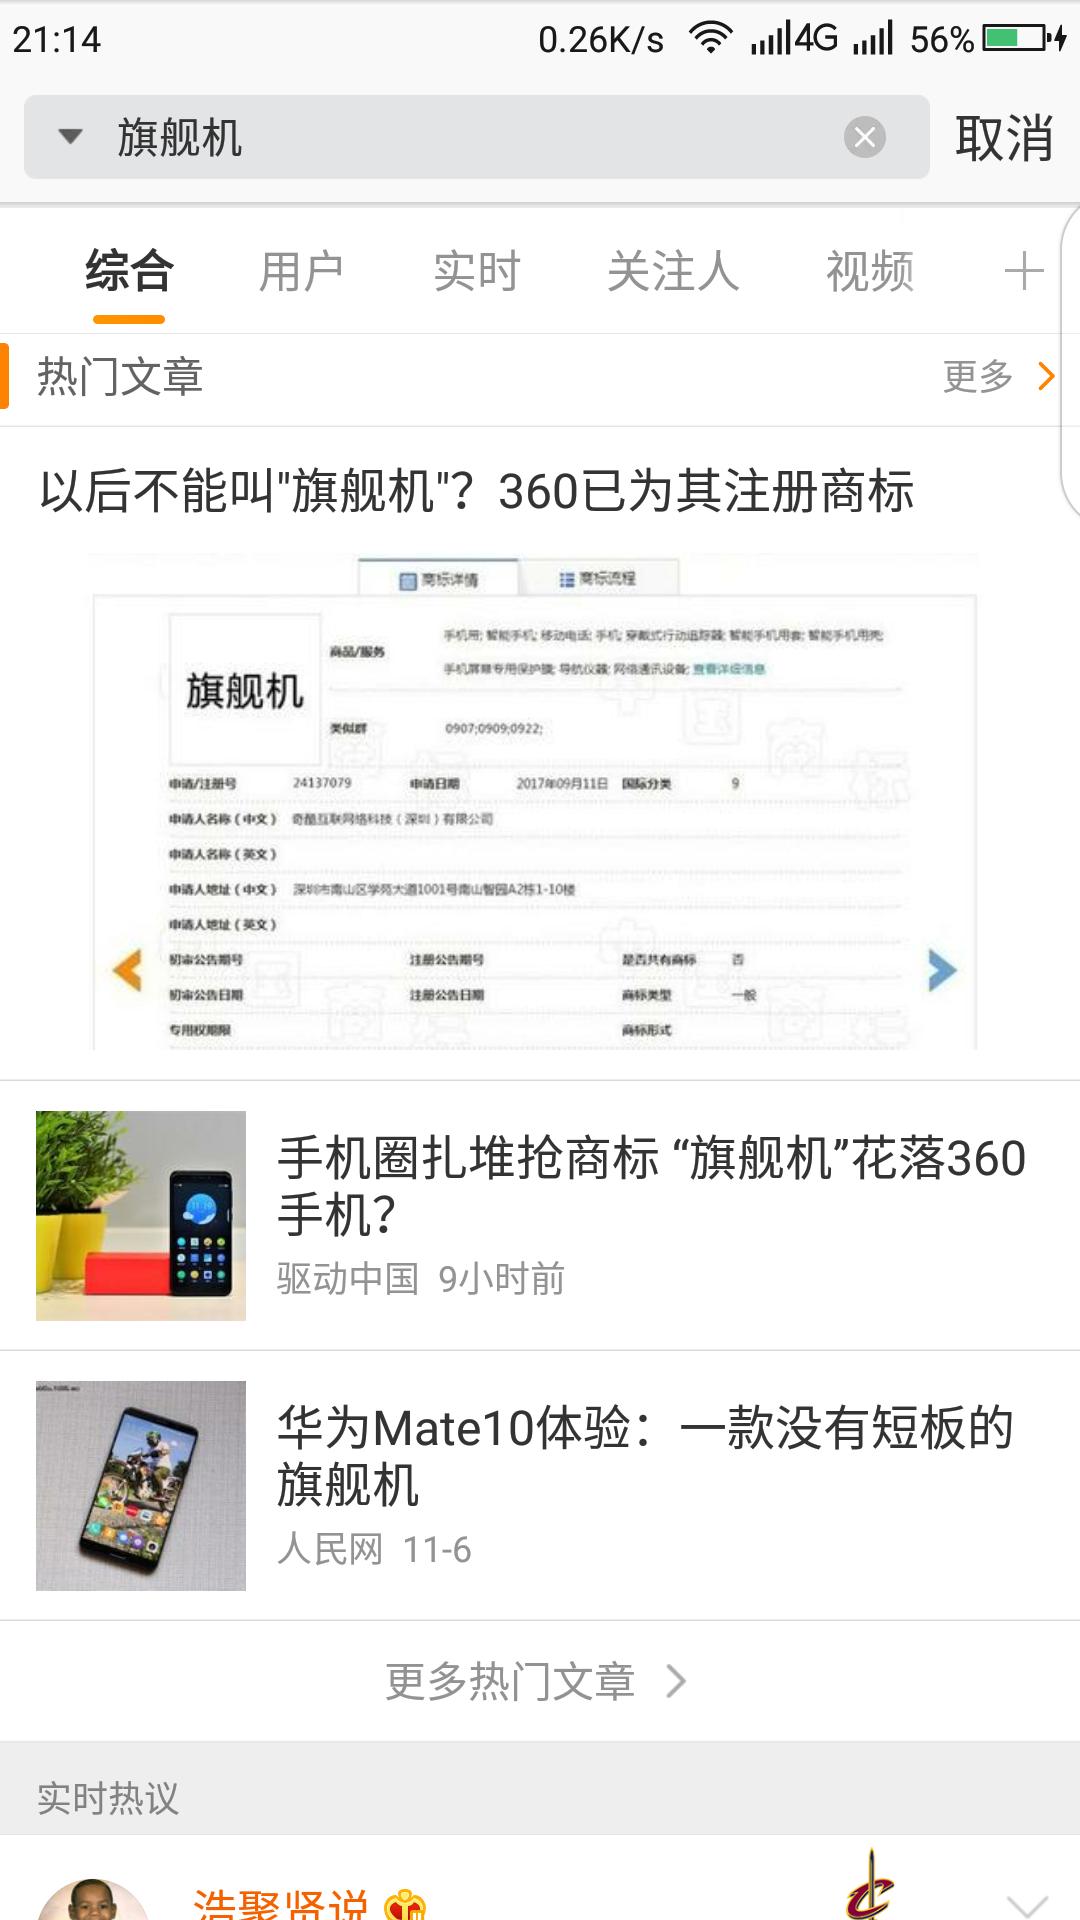 Screenshot_2017-11-14-21-14-40.png